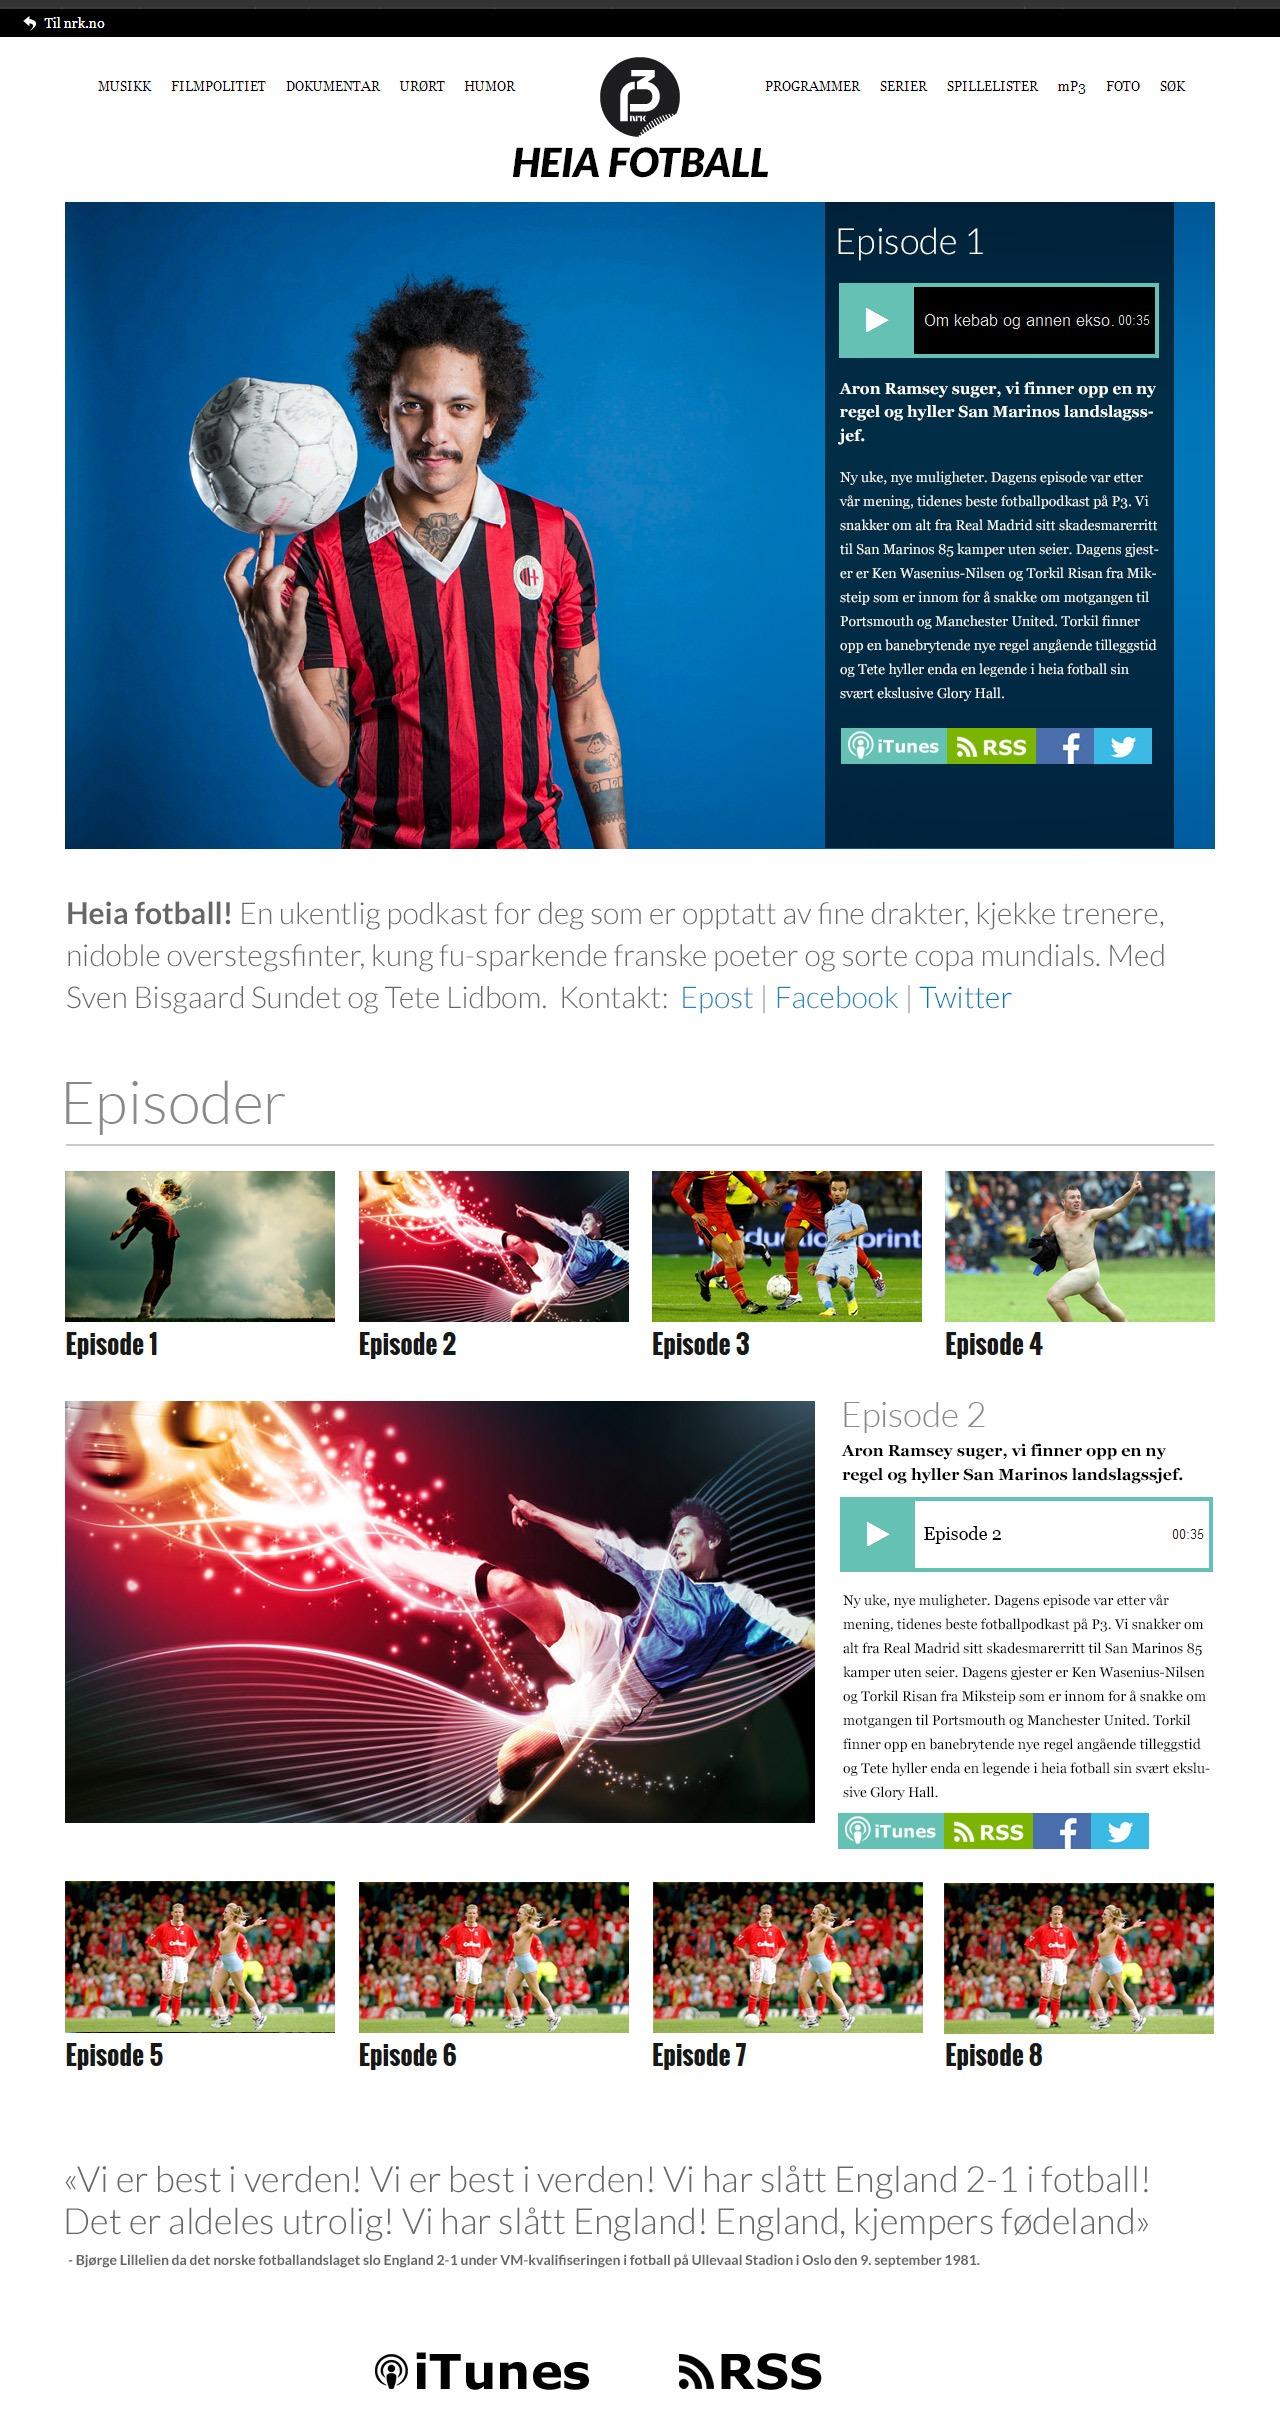 Heia Fotball designskisse